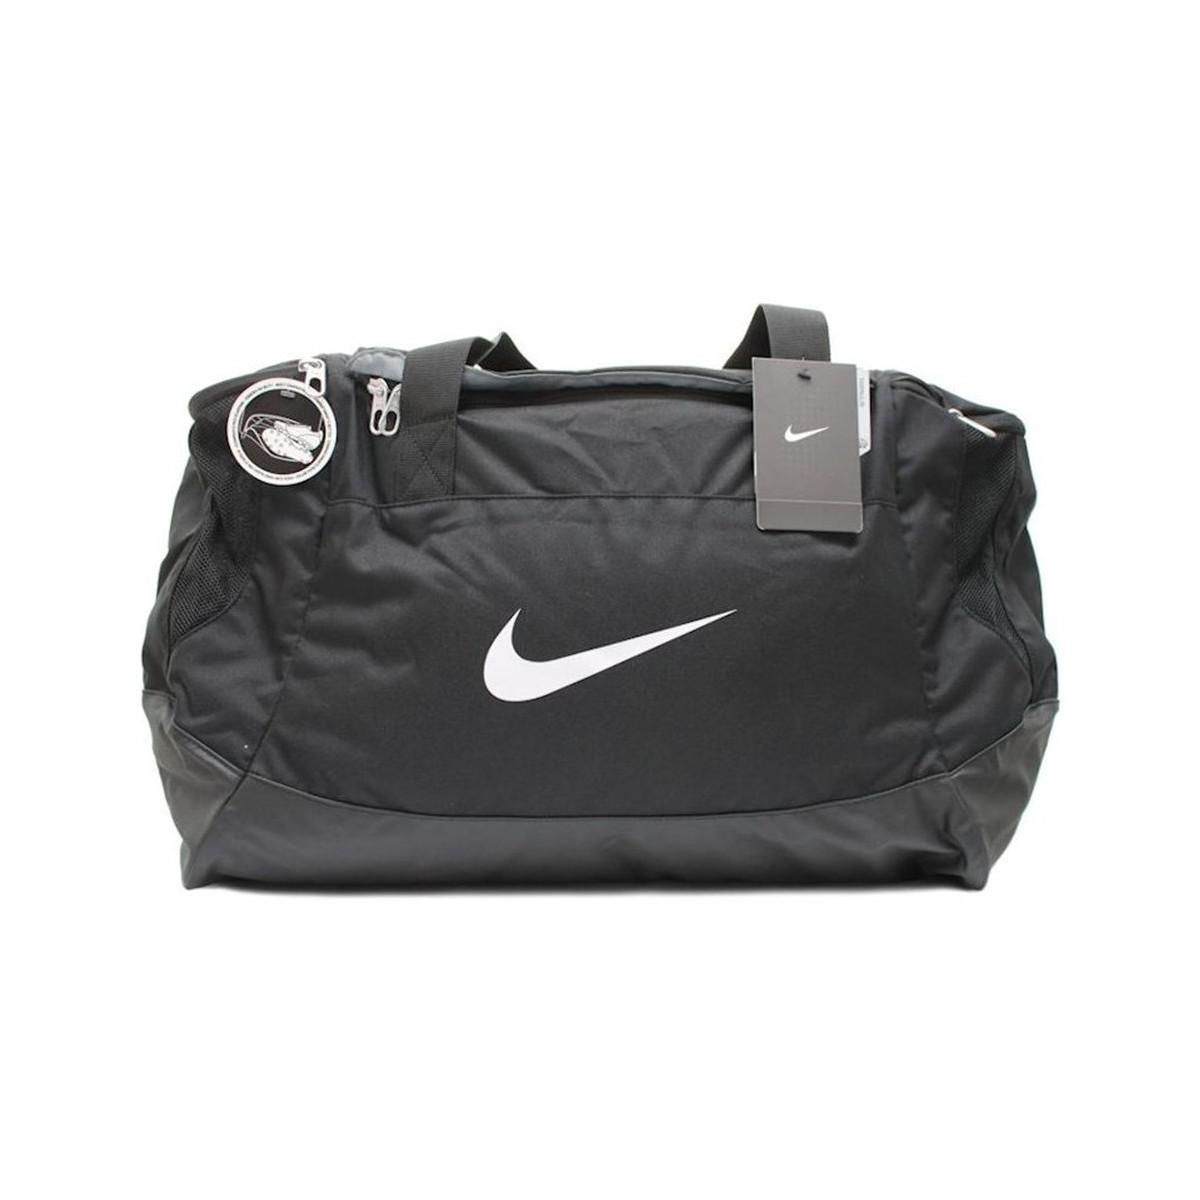 fc0b5747a656 Nike Club Team Swoosh Men s Sports Bag In Black in Black for Men - Lyst